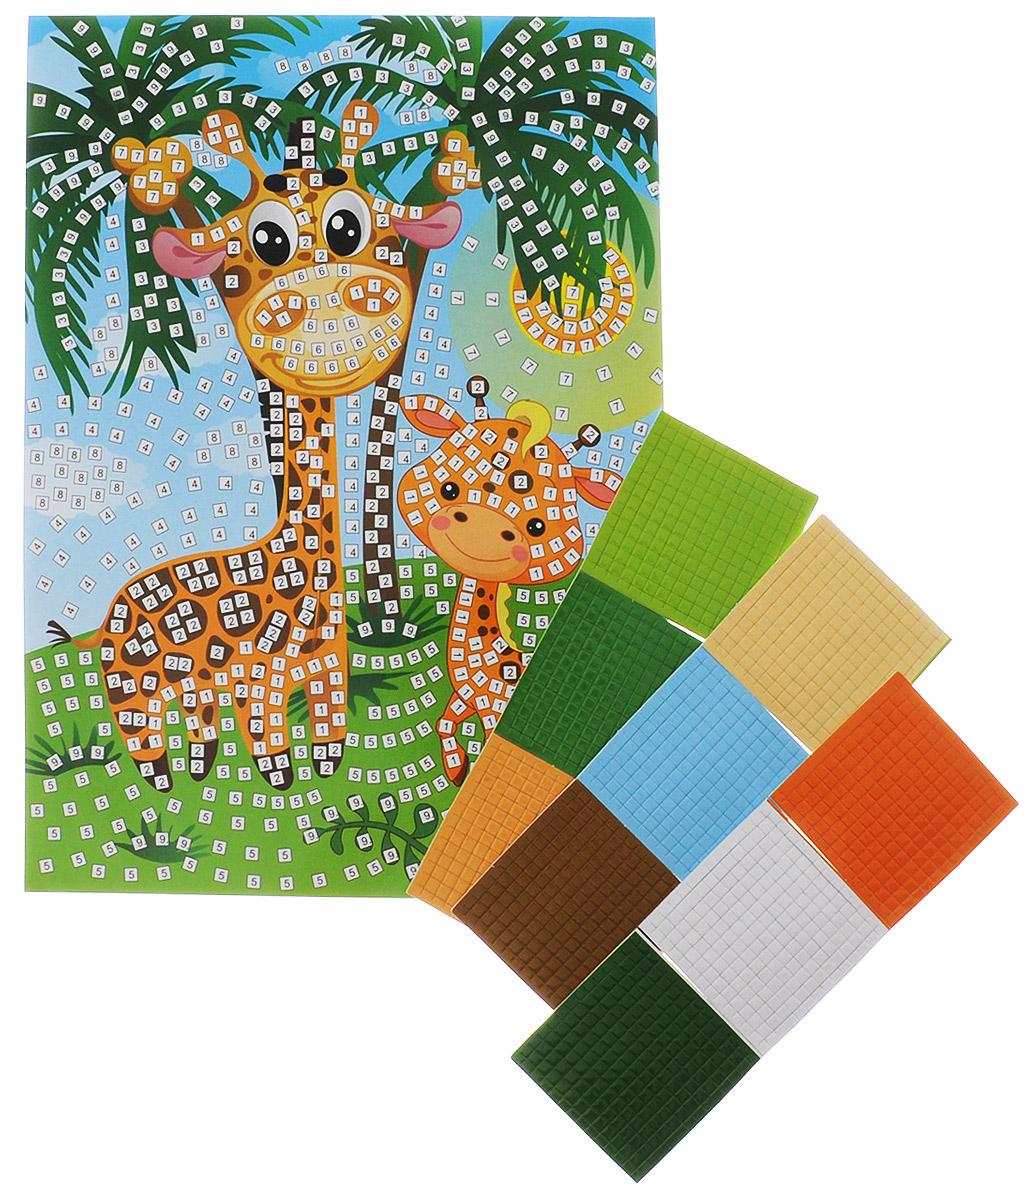 Рыжий Кот Мозаика мягкая Жирафы пазлы апплика мозаика мягкая цифры из самоклеящегося мягкого пластика eva